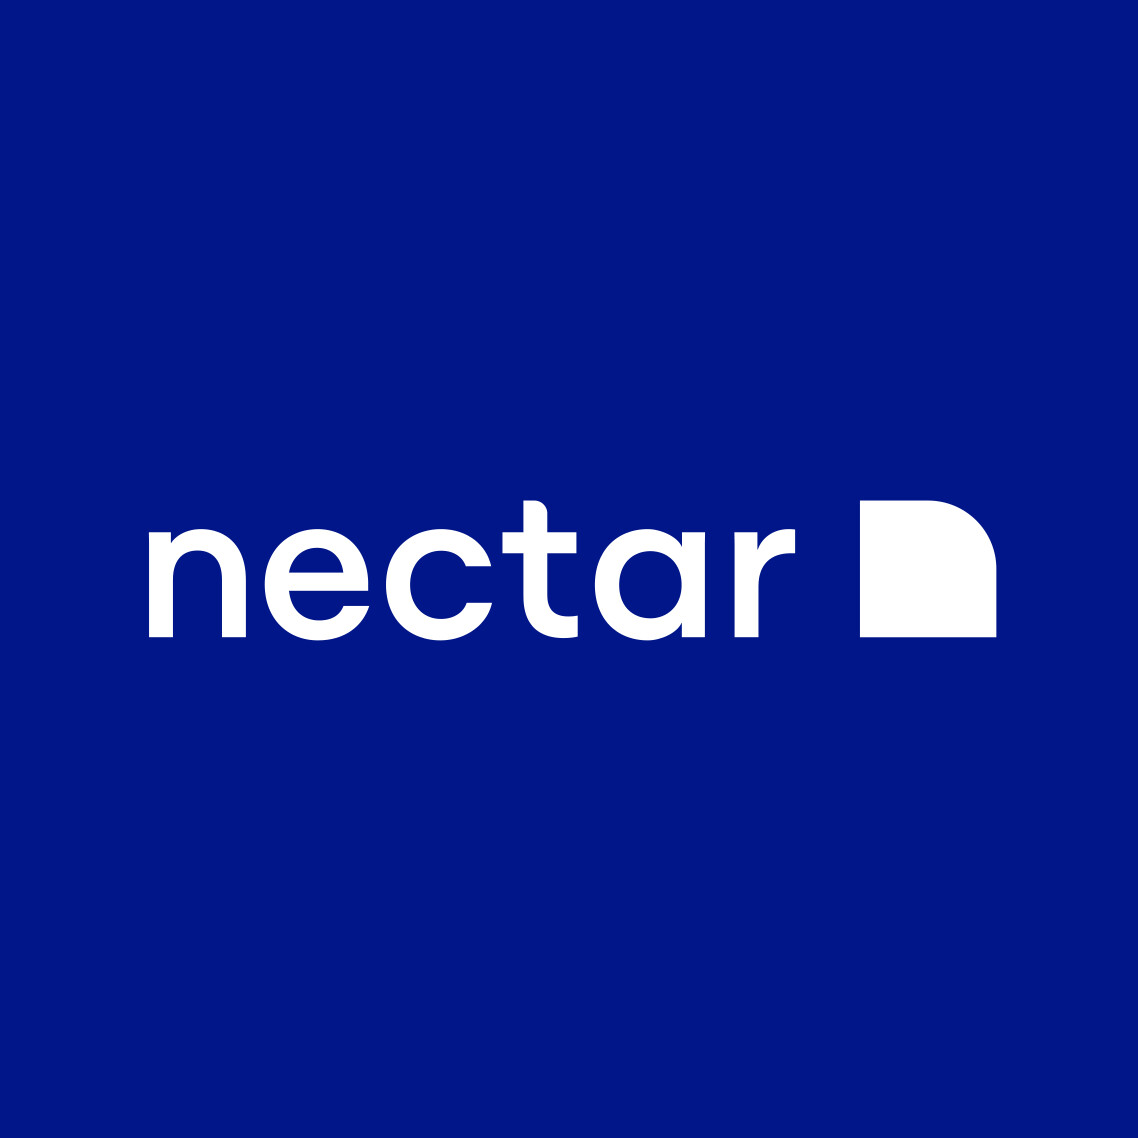 Nectar Sleep Vouchers